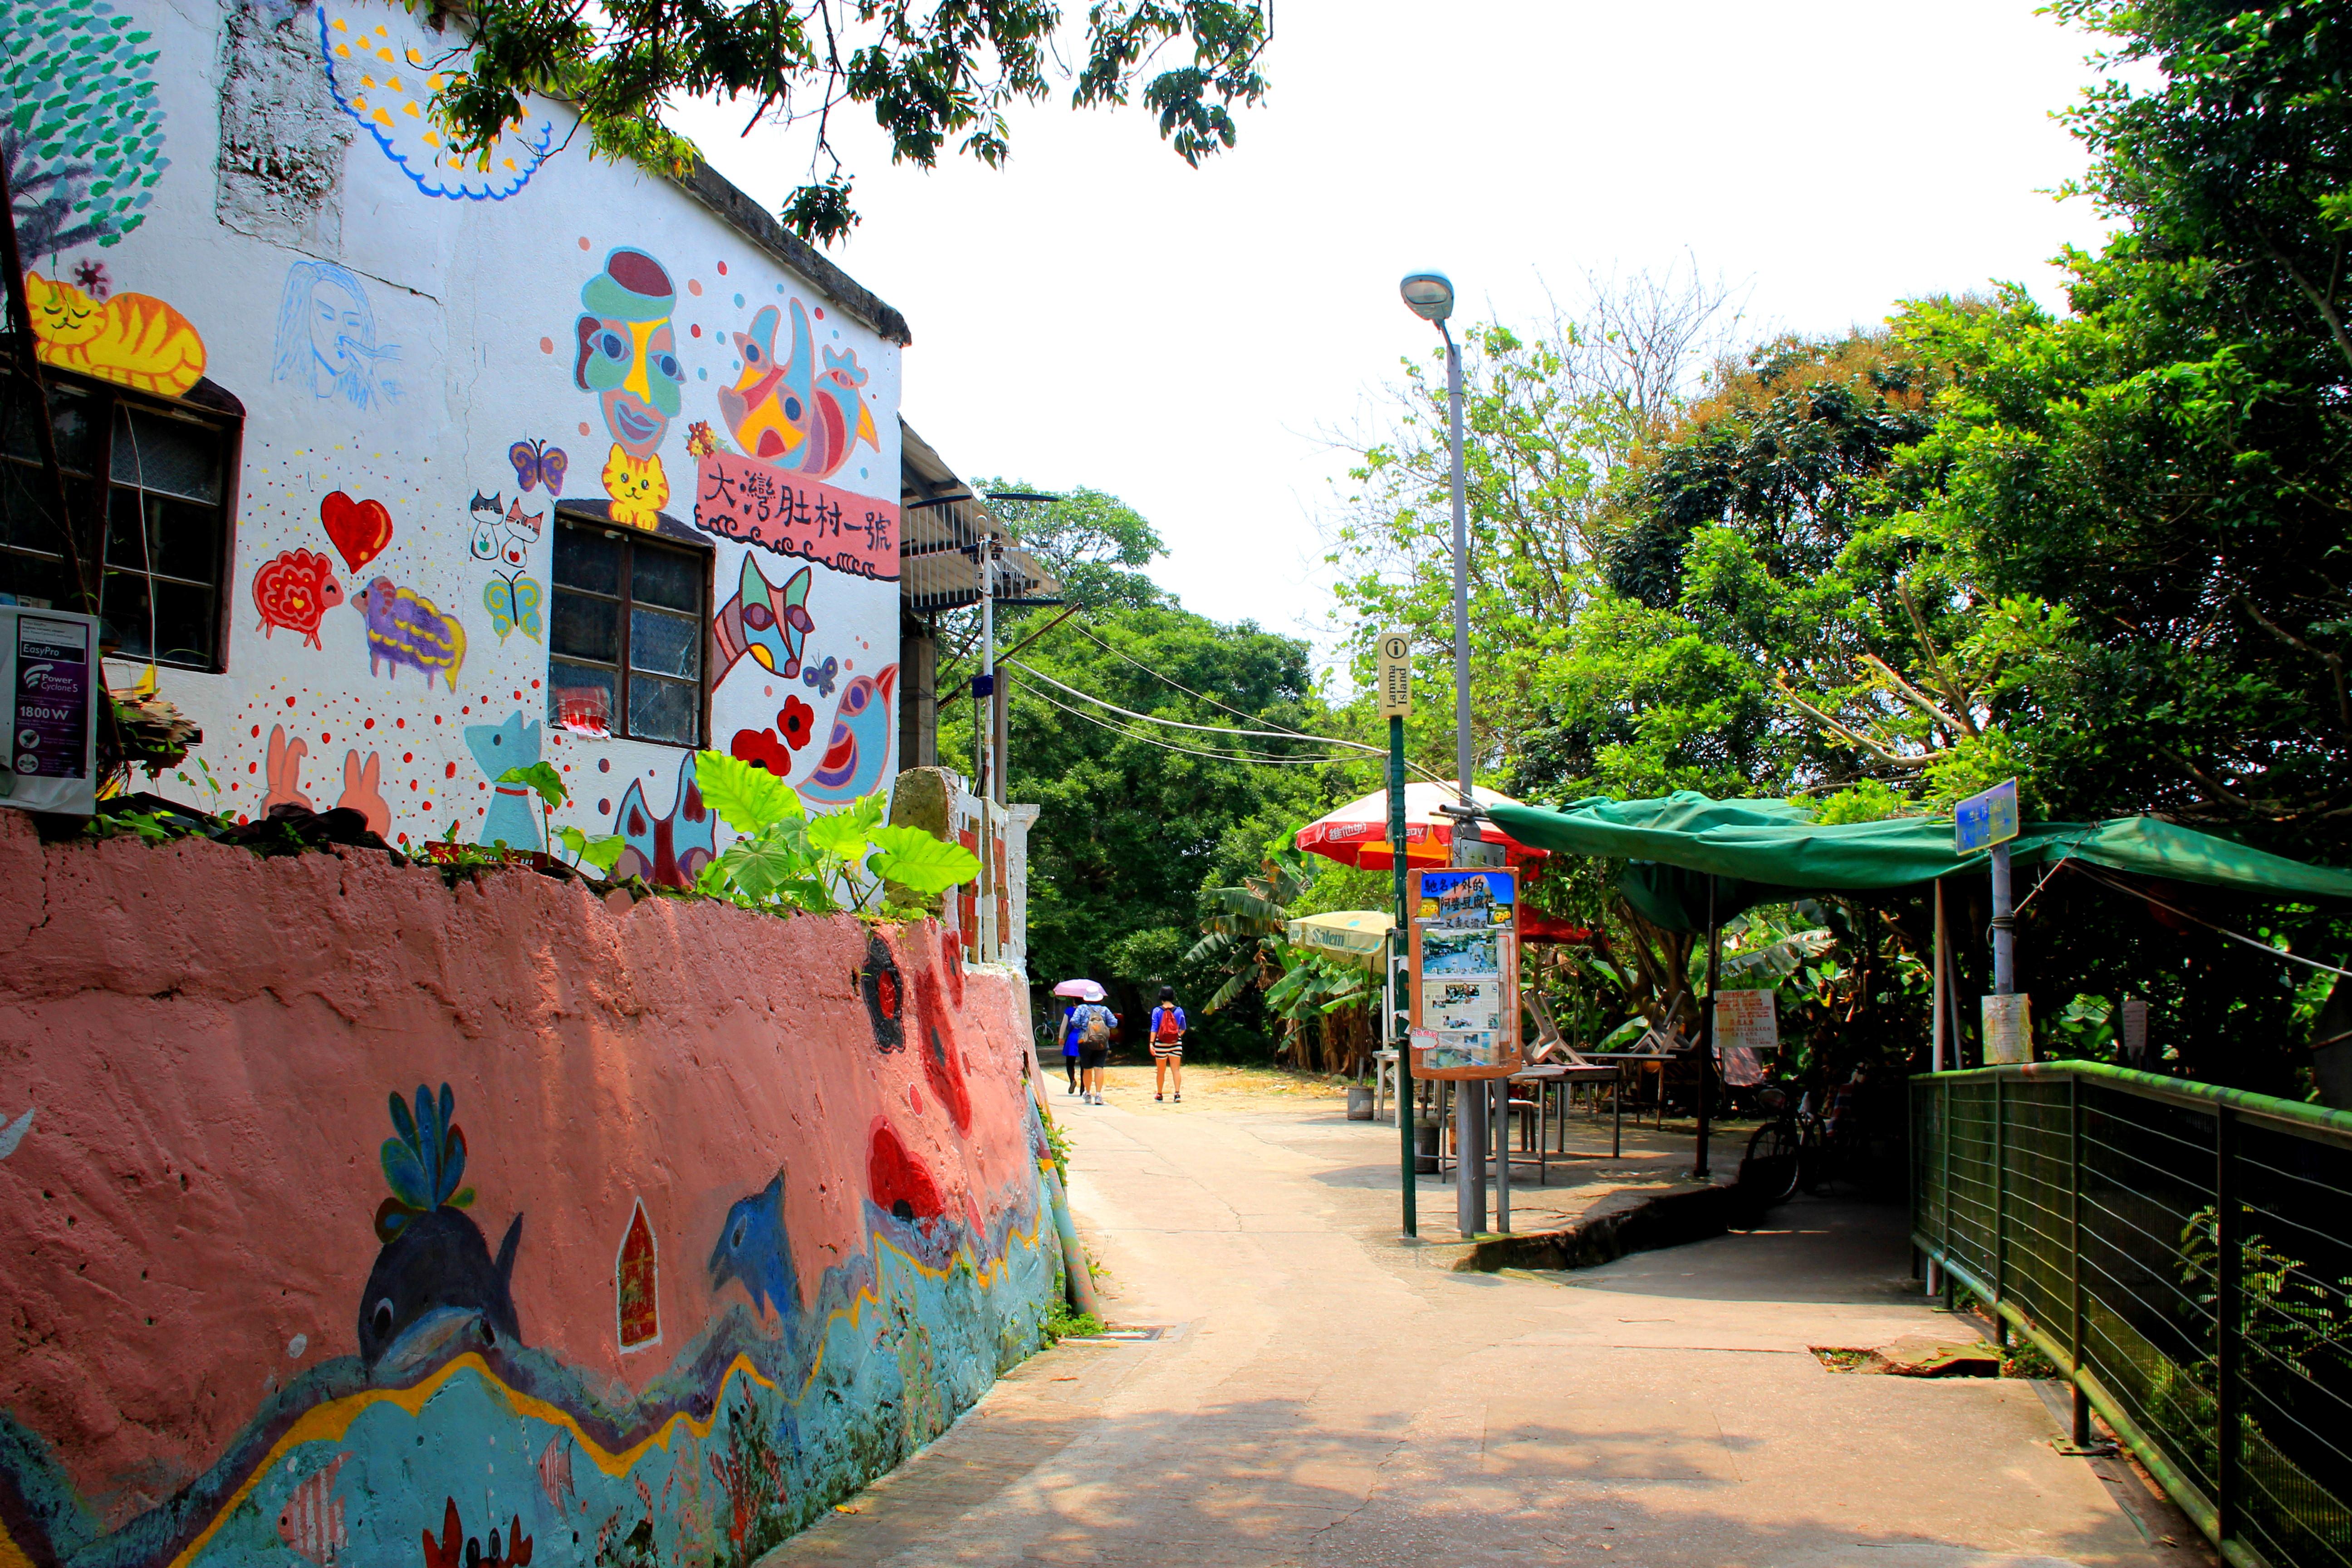 Hong Kong: Lamma Island, Flower Market, Yuen Po Street Bird Garden, Ladies' Market, Temple Street Night Market